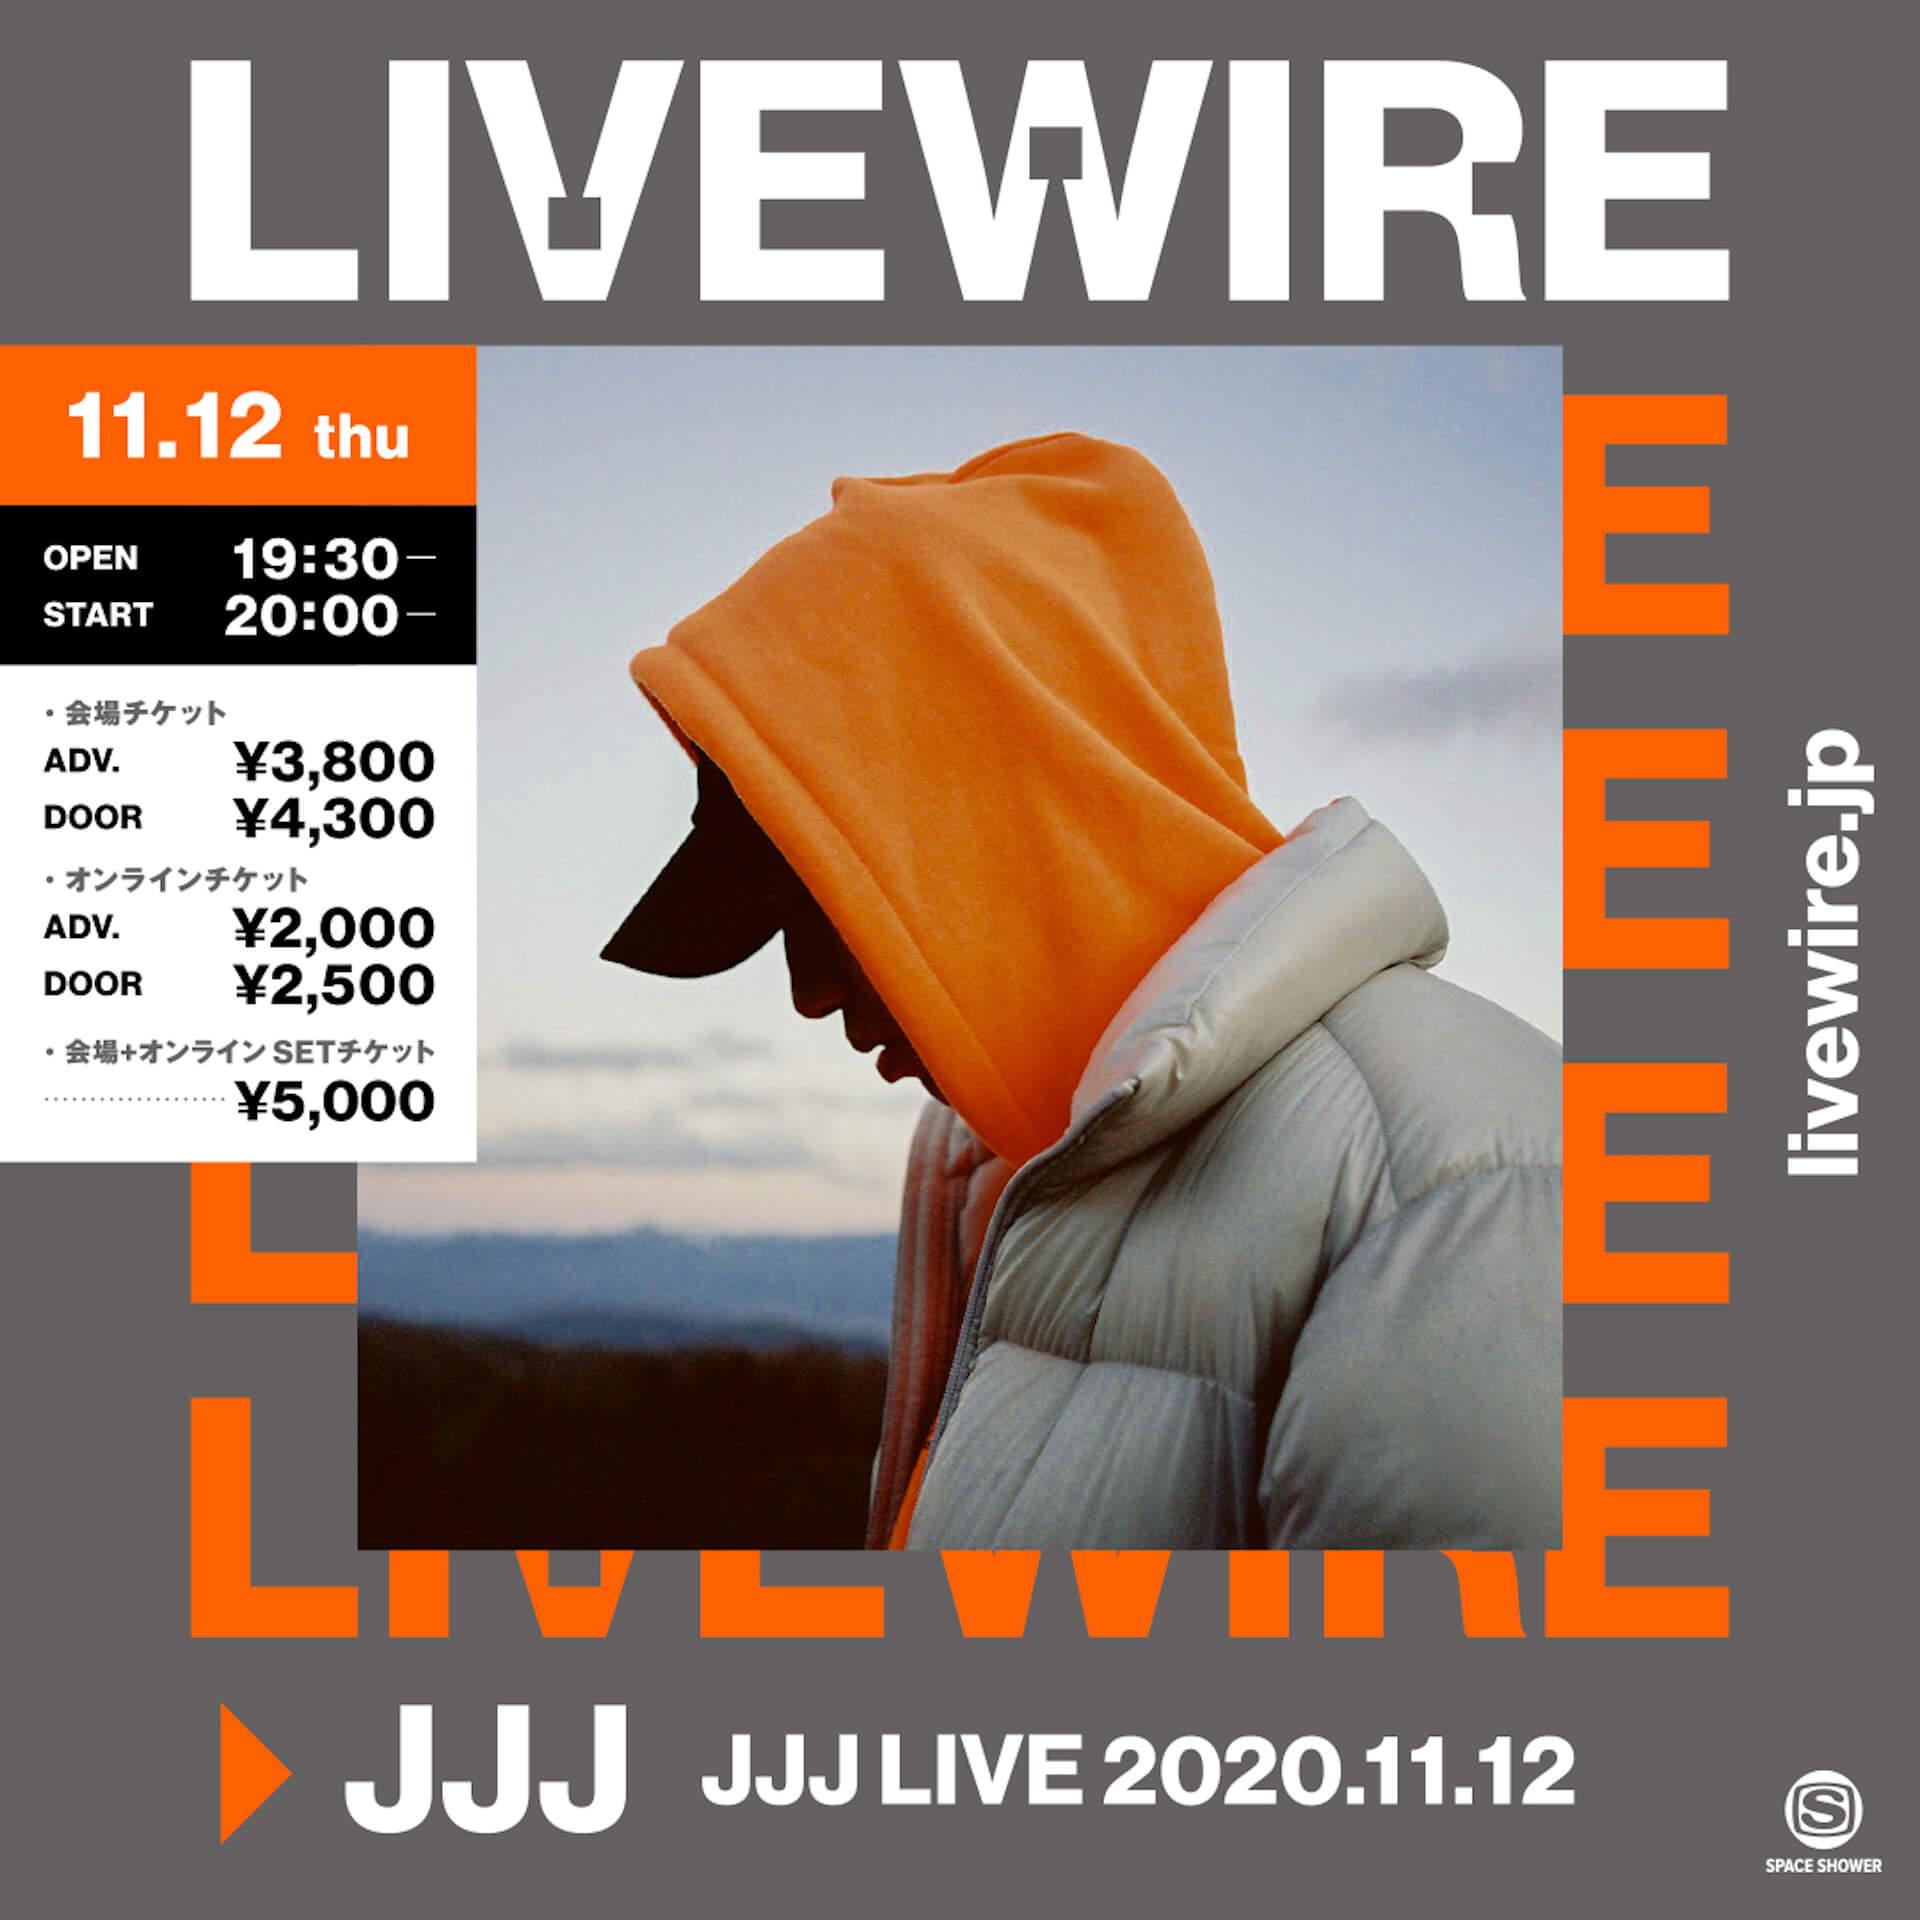 JJJによる3年ぶりのワンマンライブが恵比寿LIQUIDROOMで開催決定!LIVEWIREにて生配信も music201027_jjj_live_2